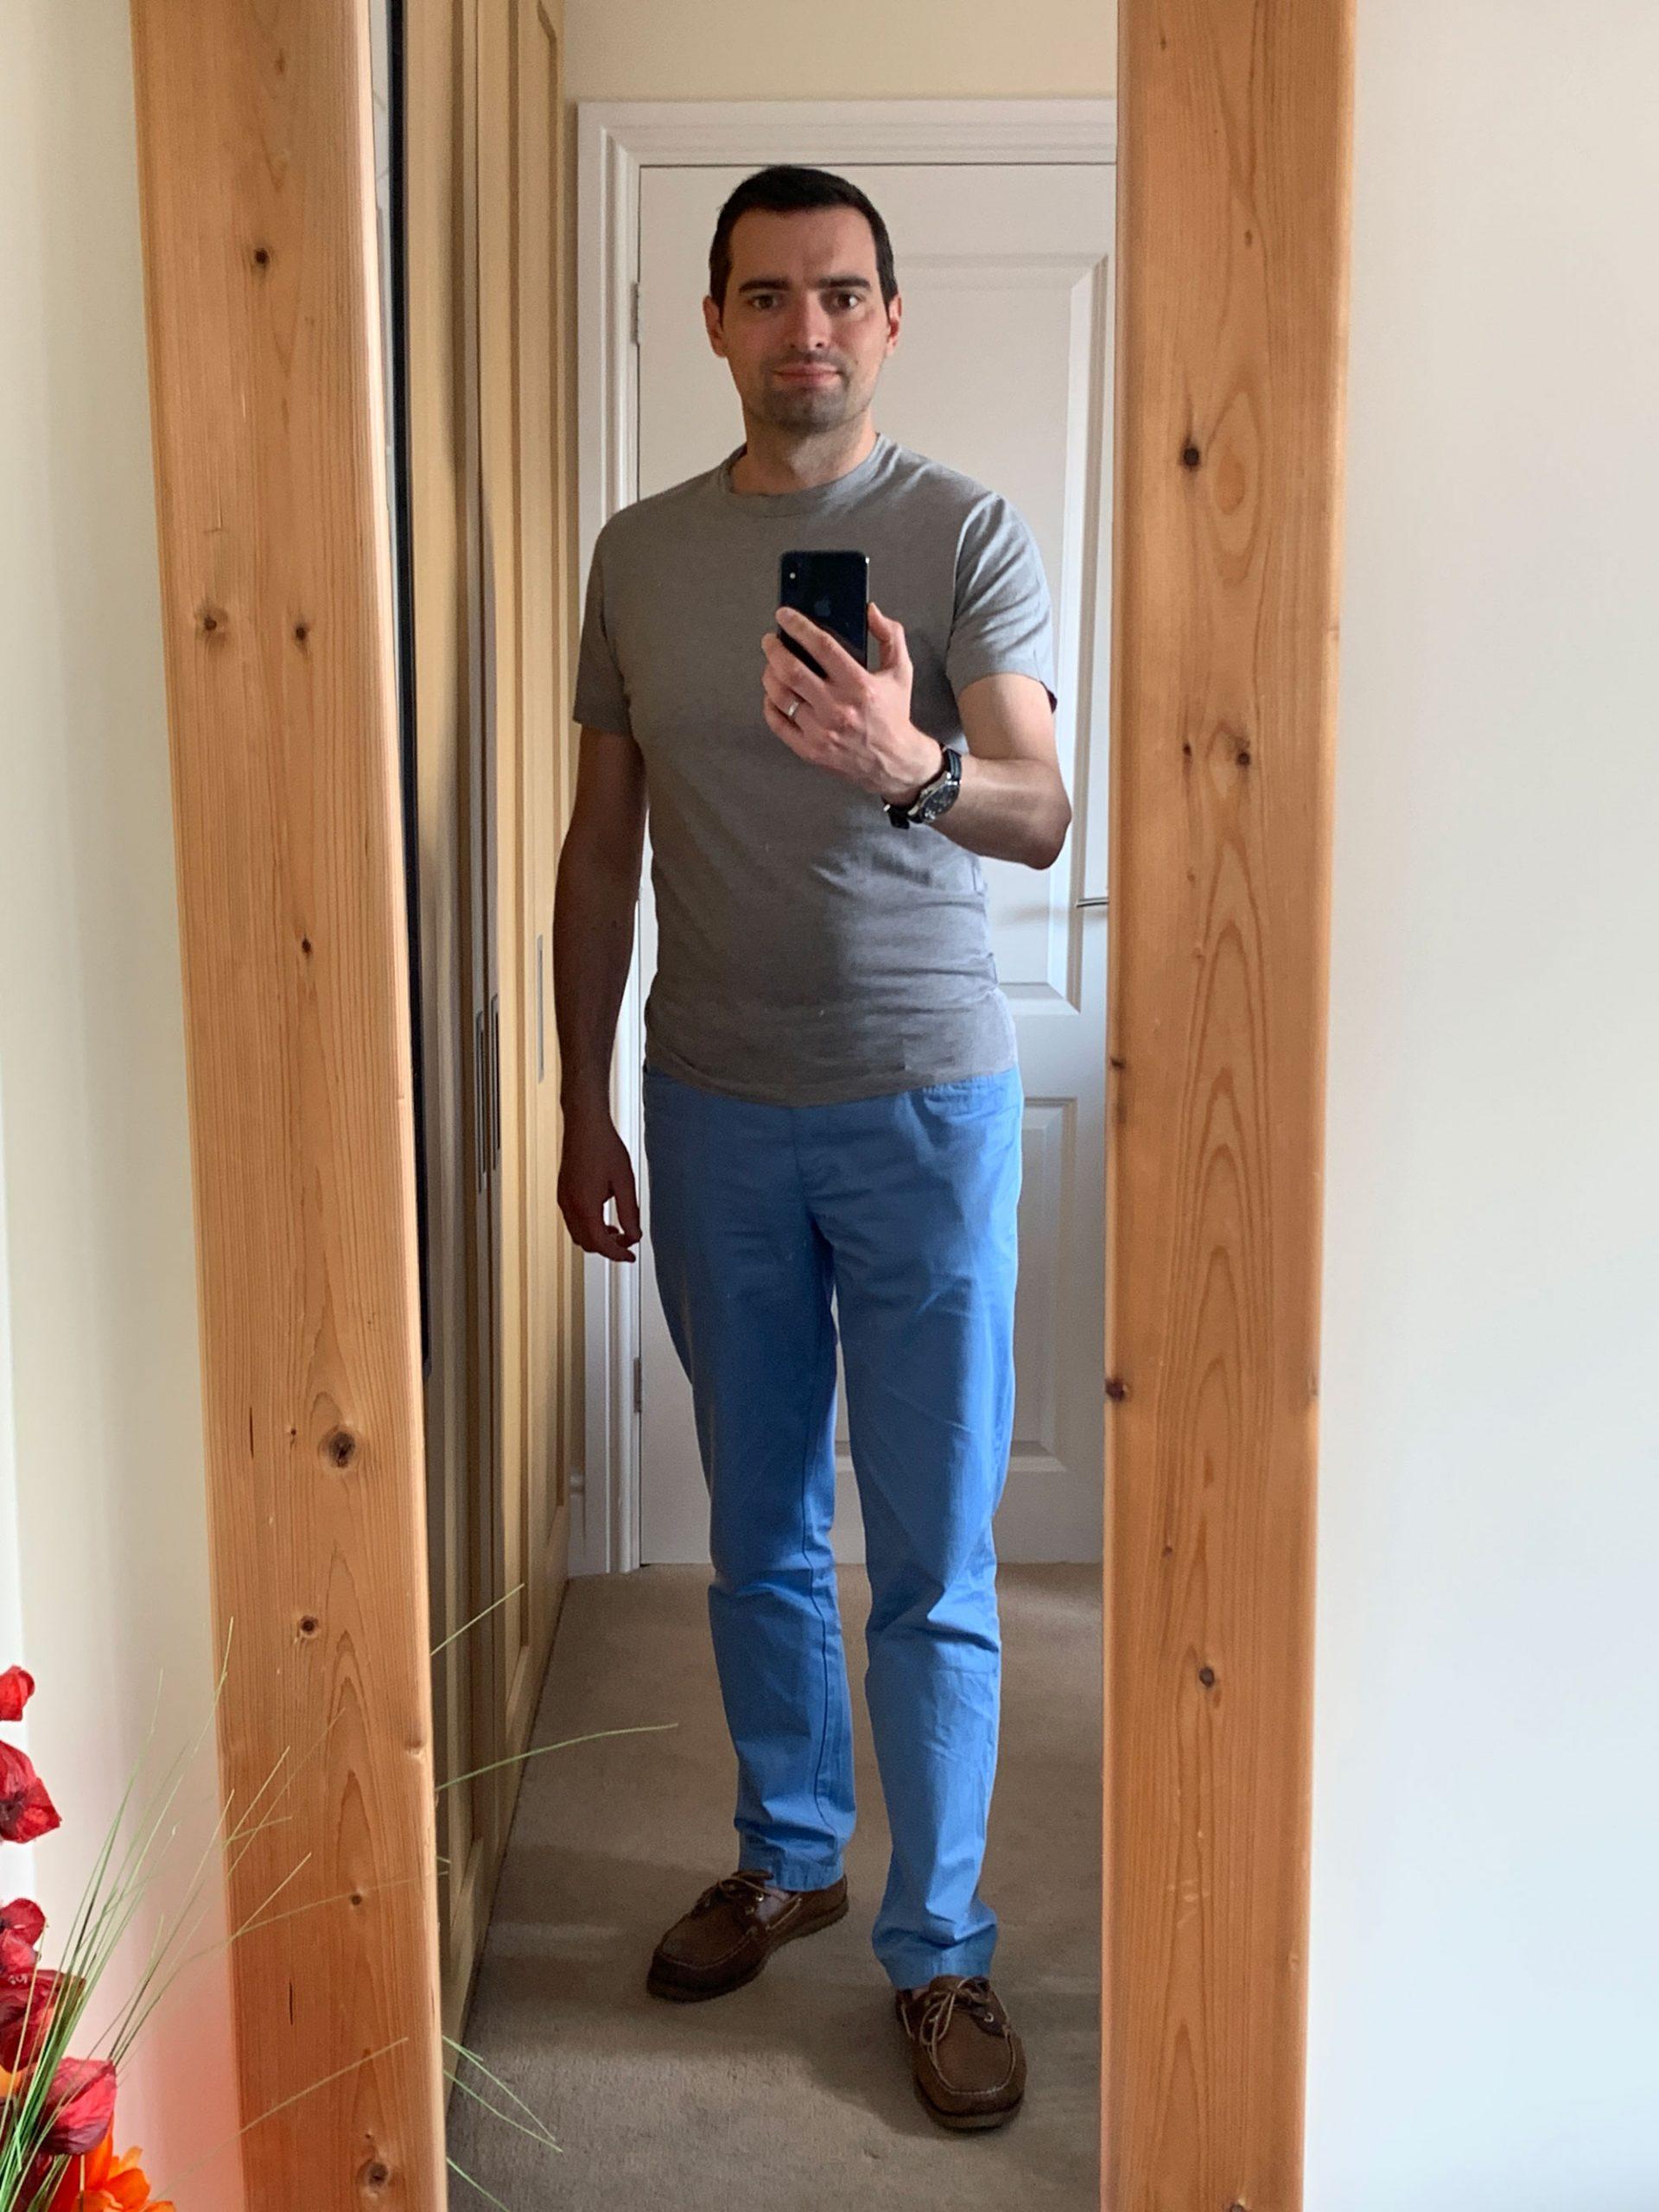 Daniel selfie wearing tee